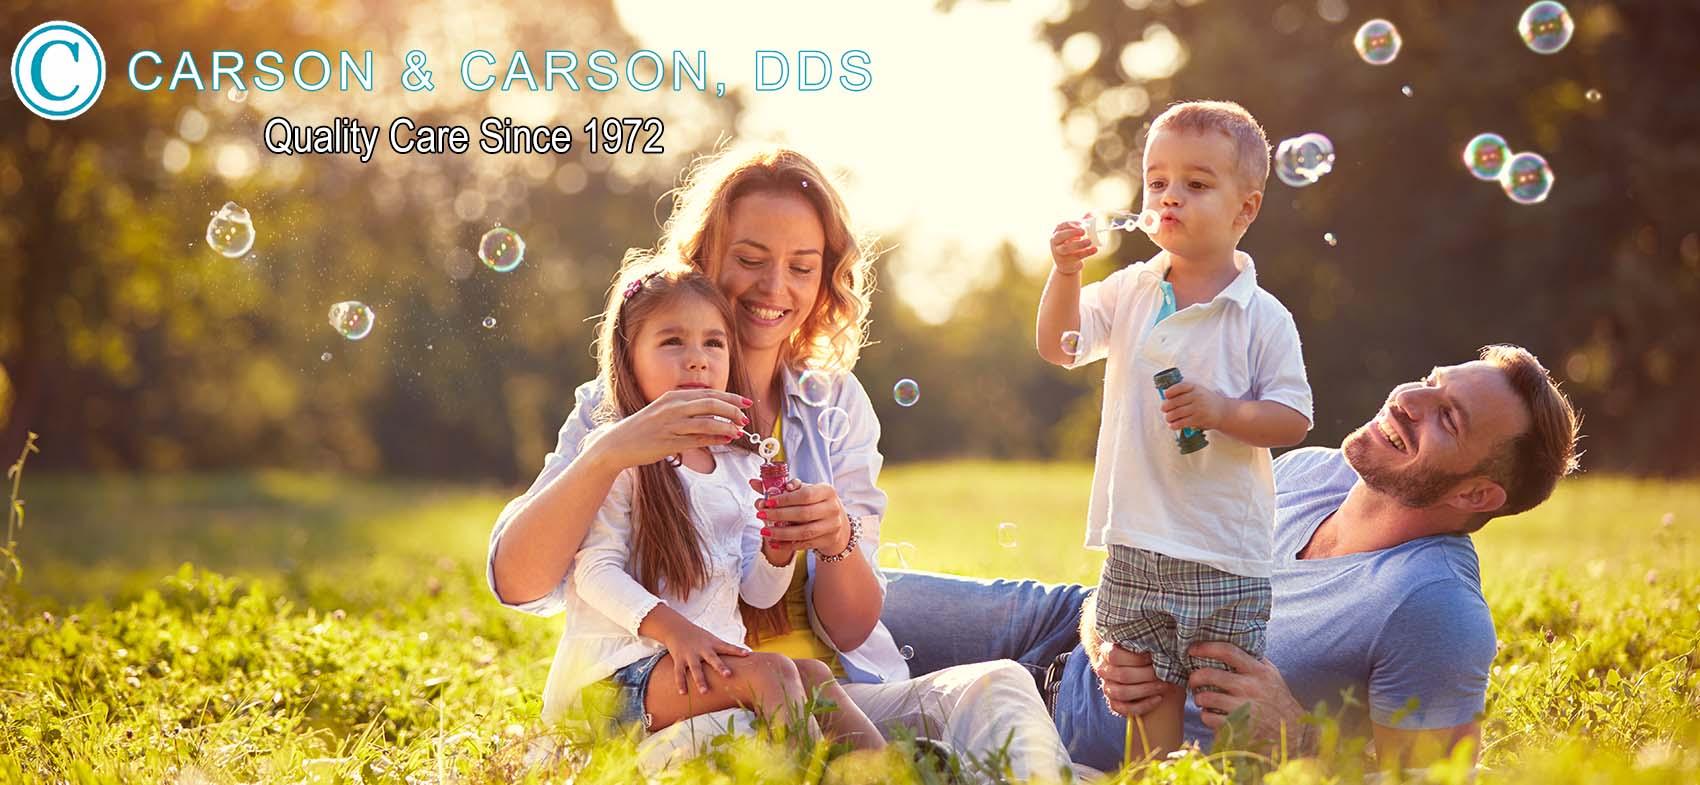 CarsonDDS-Home-4